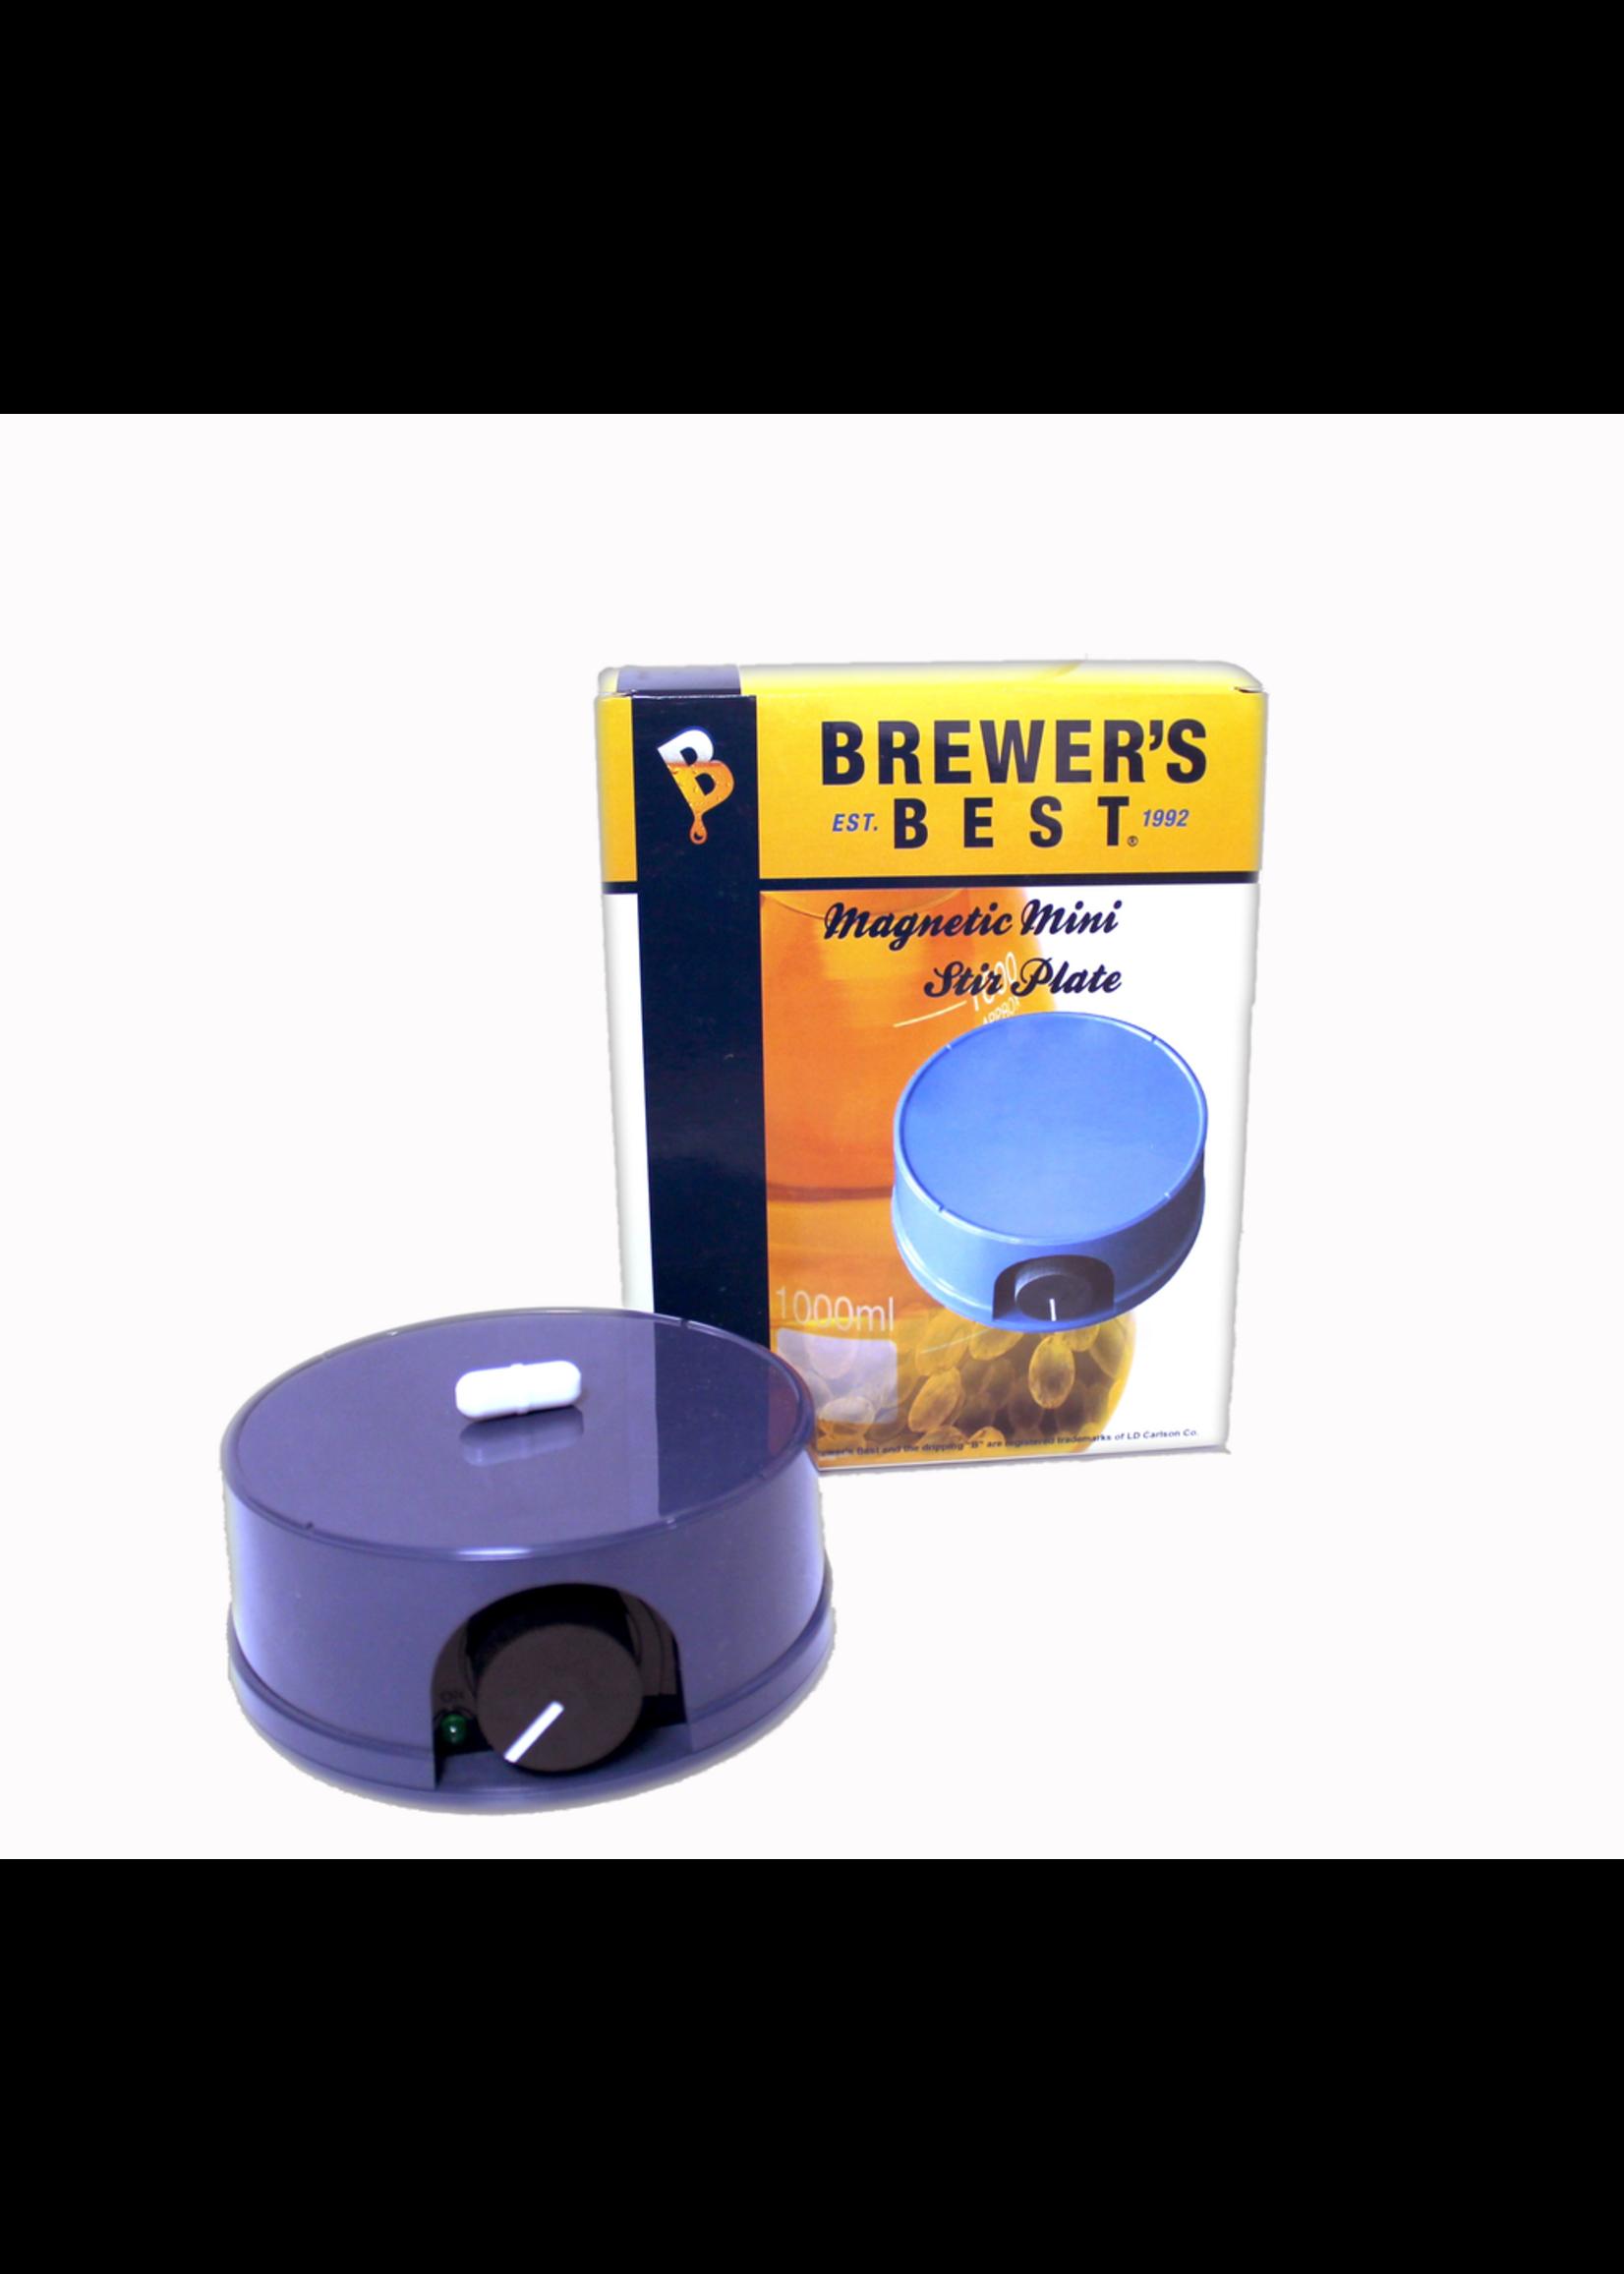 Testing Brewers Best Magnetic Mini Stir Plate